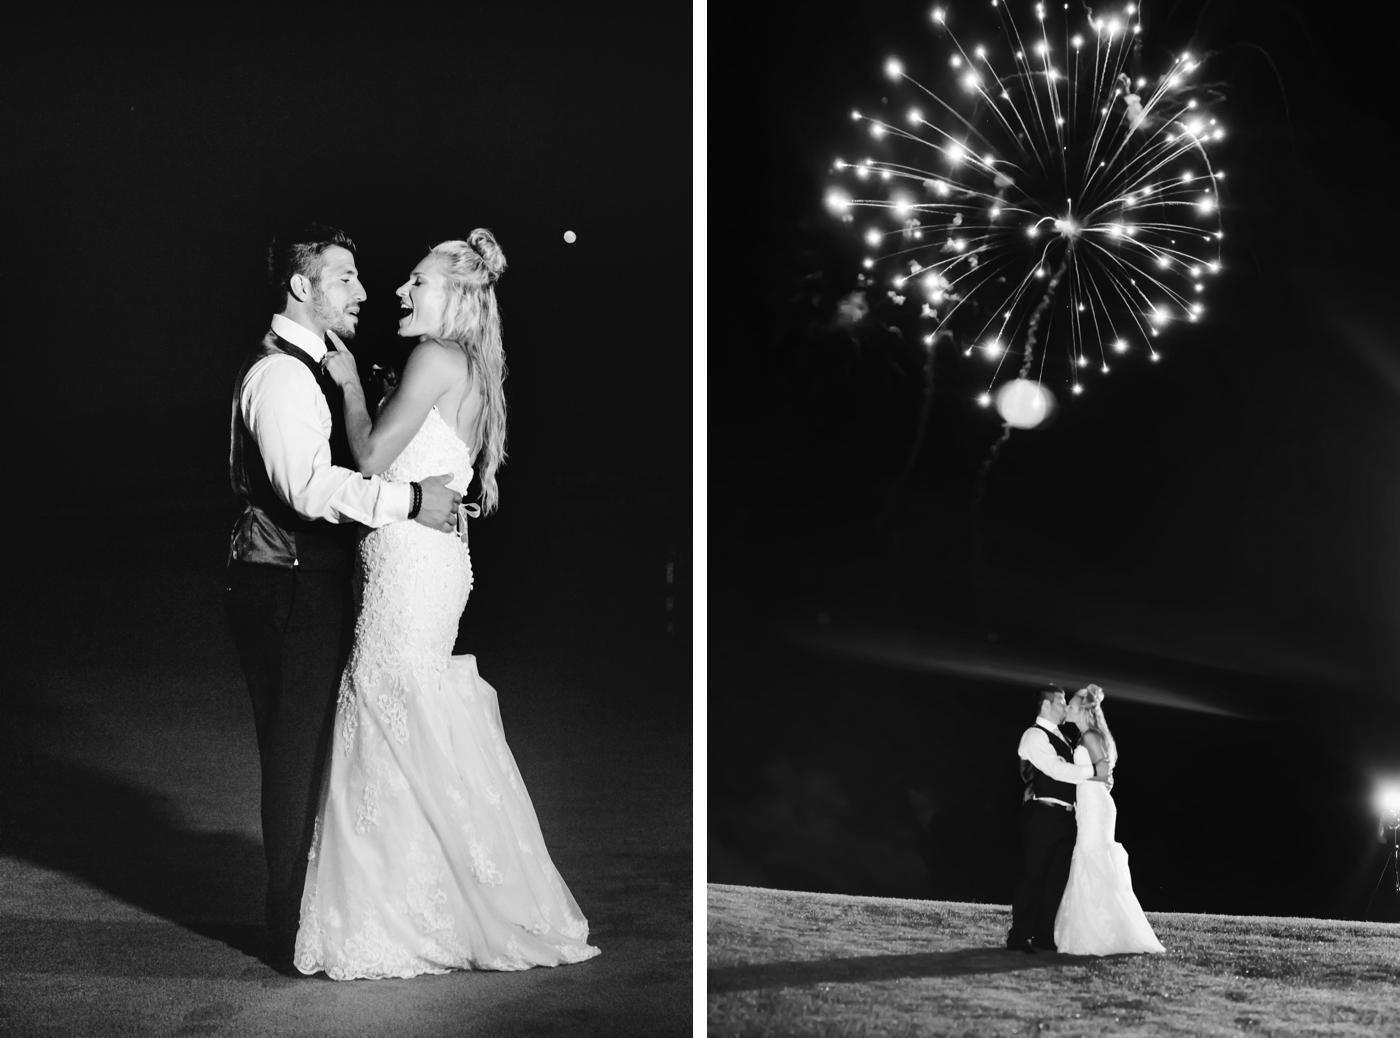 chicago-fine-art-wedding-photography-patano52